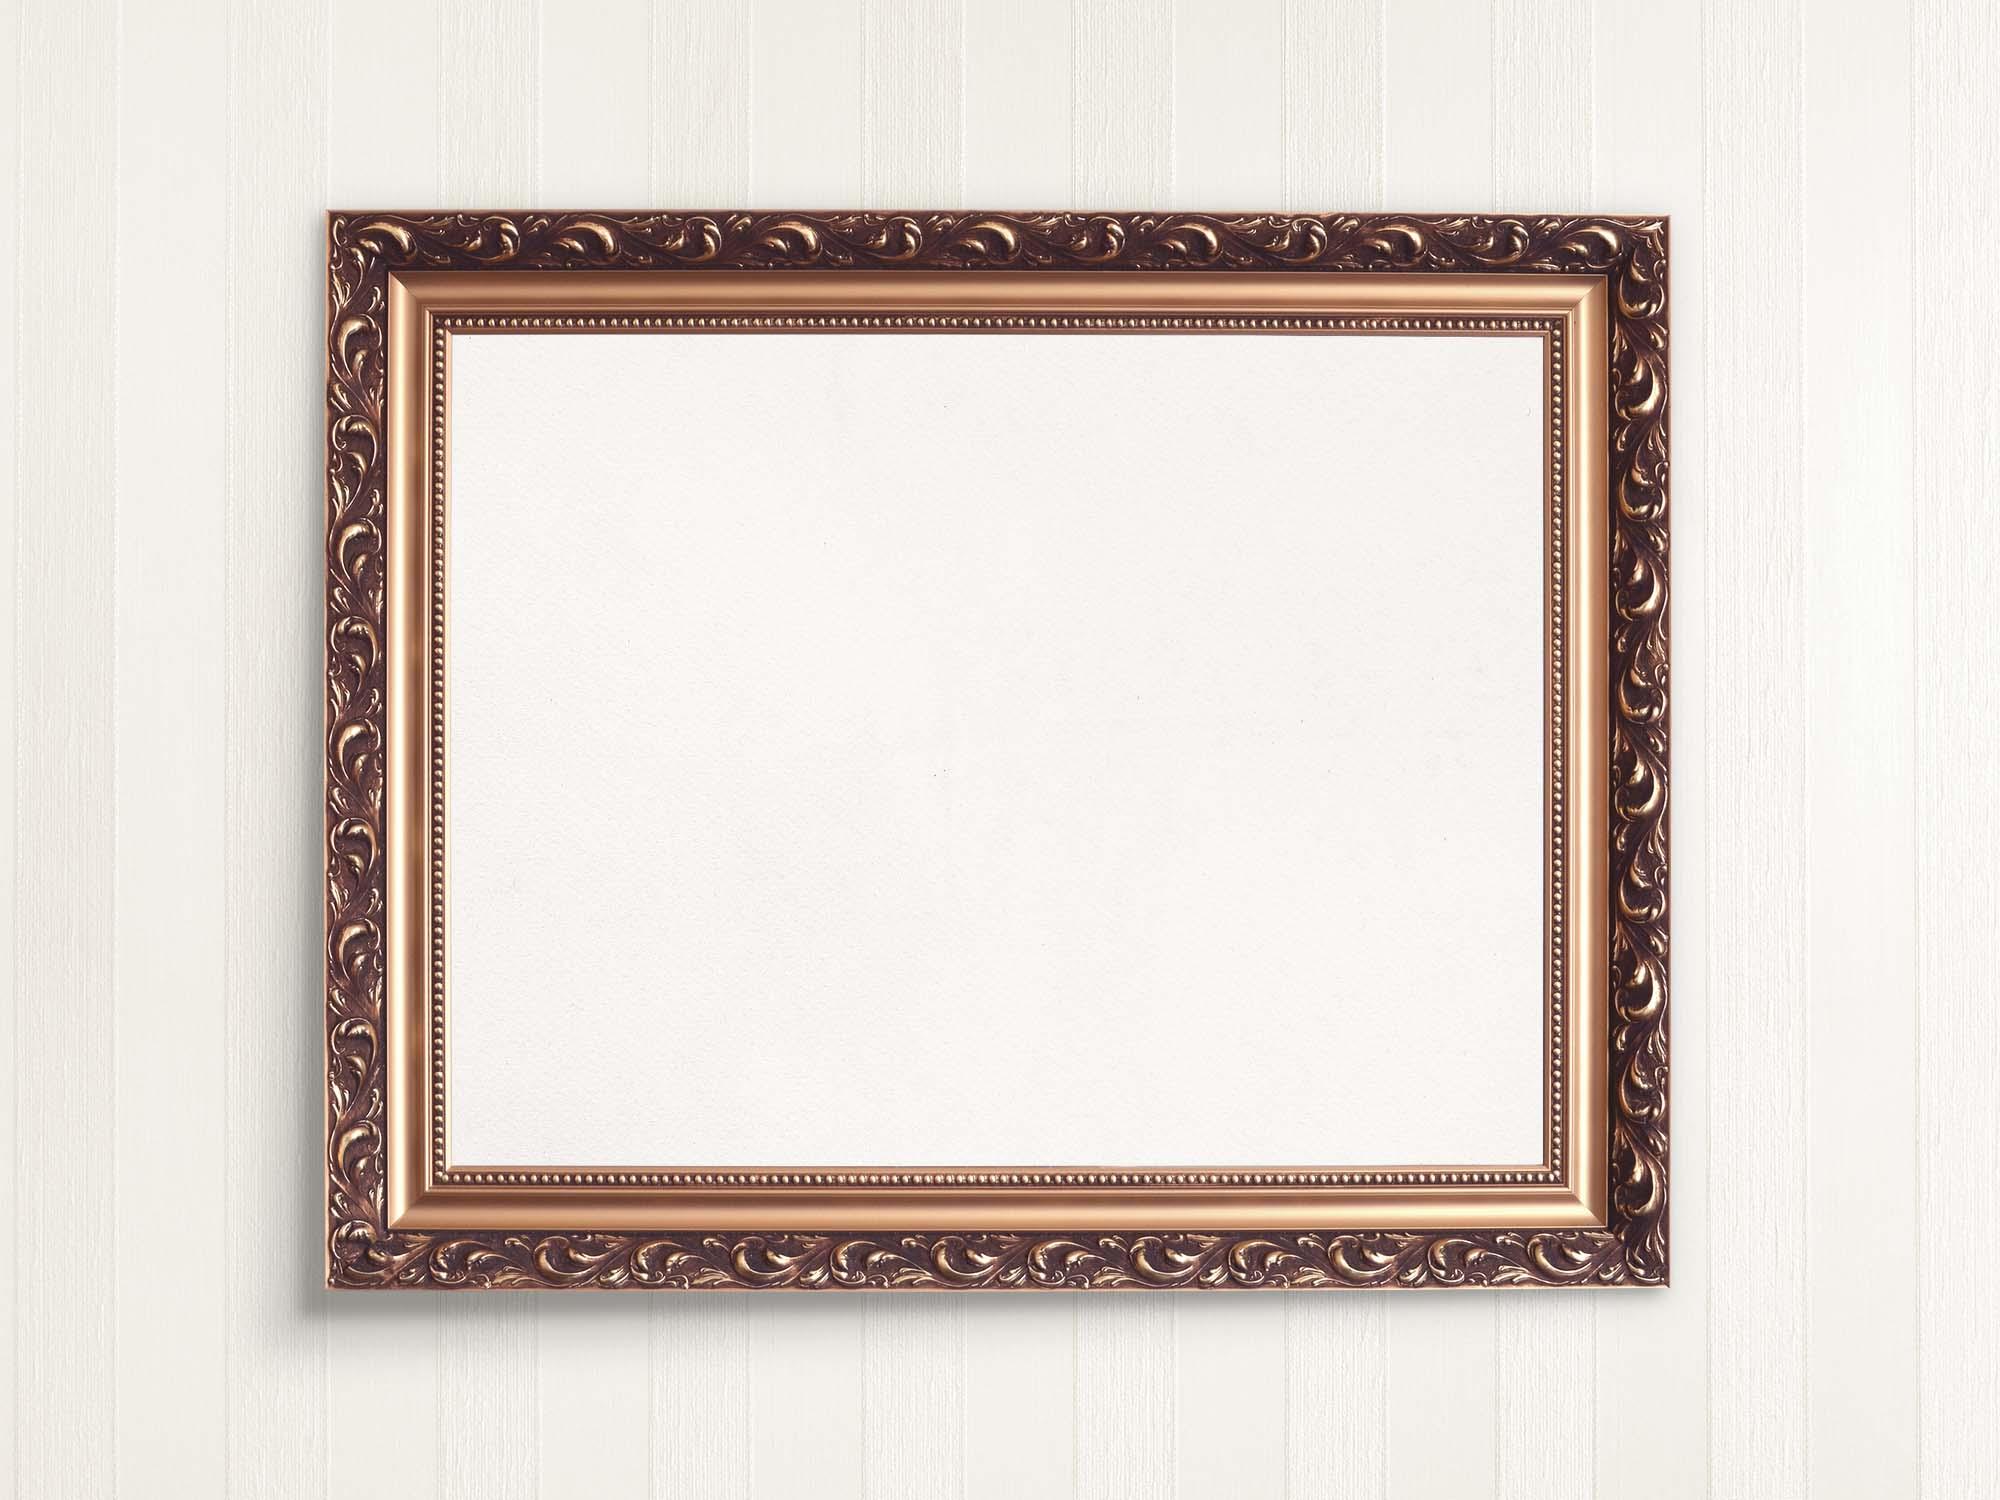 Royally Wooden Frame Mockup 2